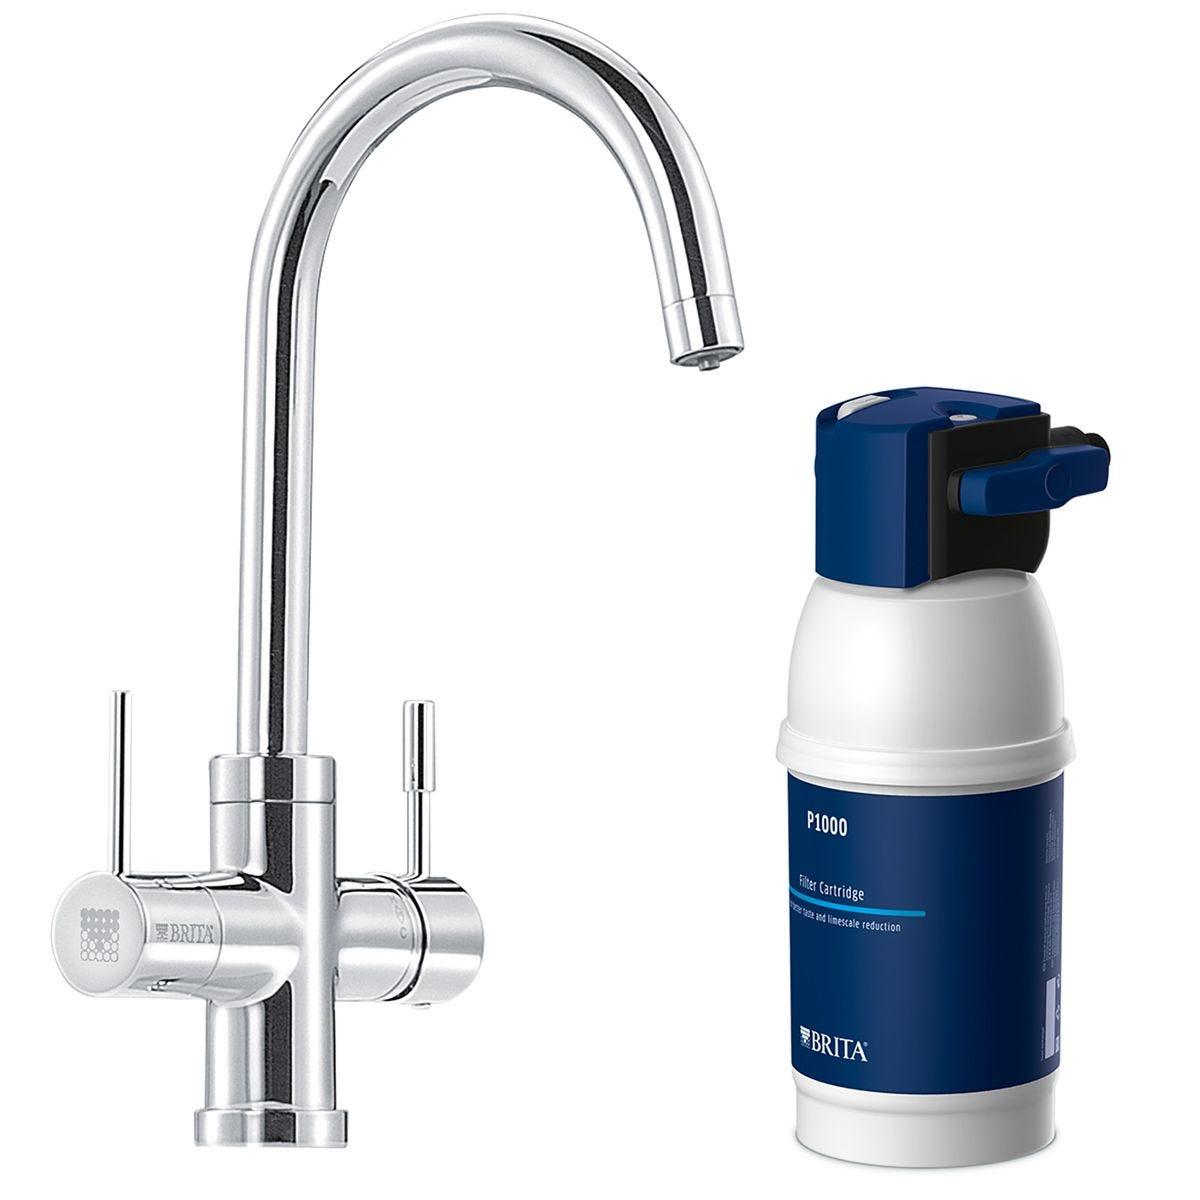 BRITA WD3030 Water Filter Talori Tap inc P1000 Cartridge